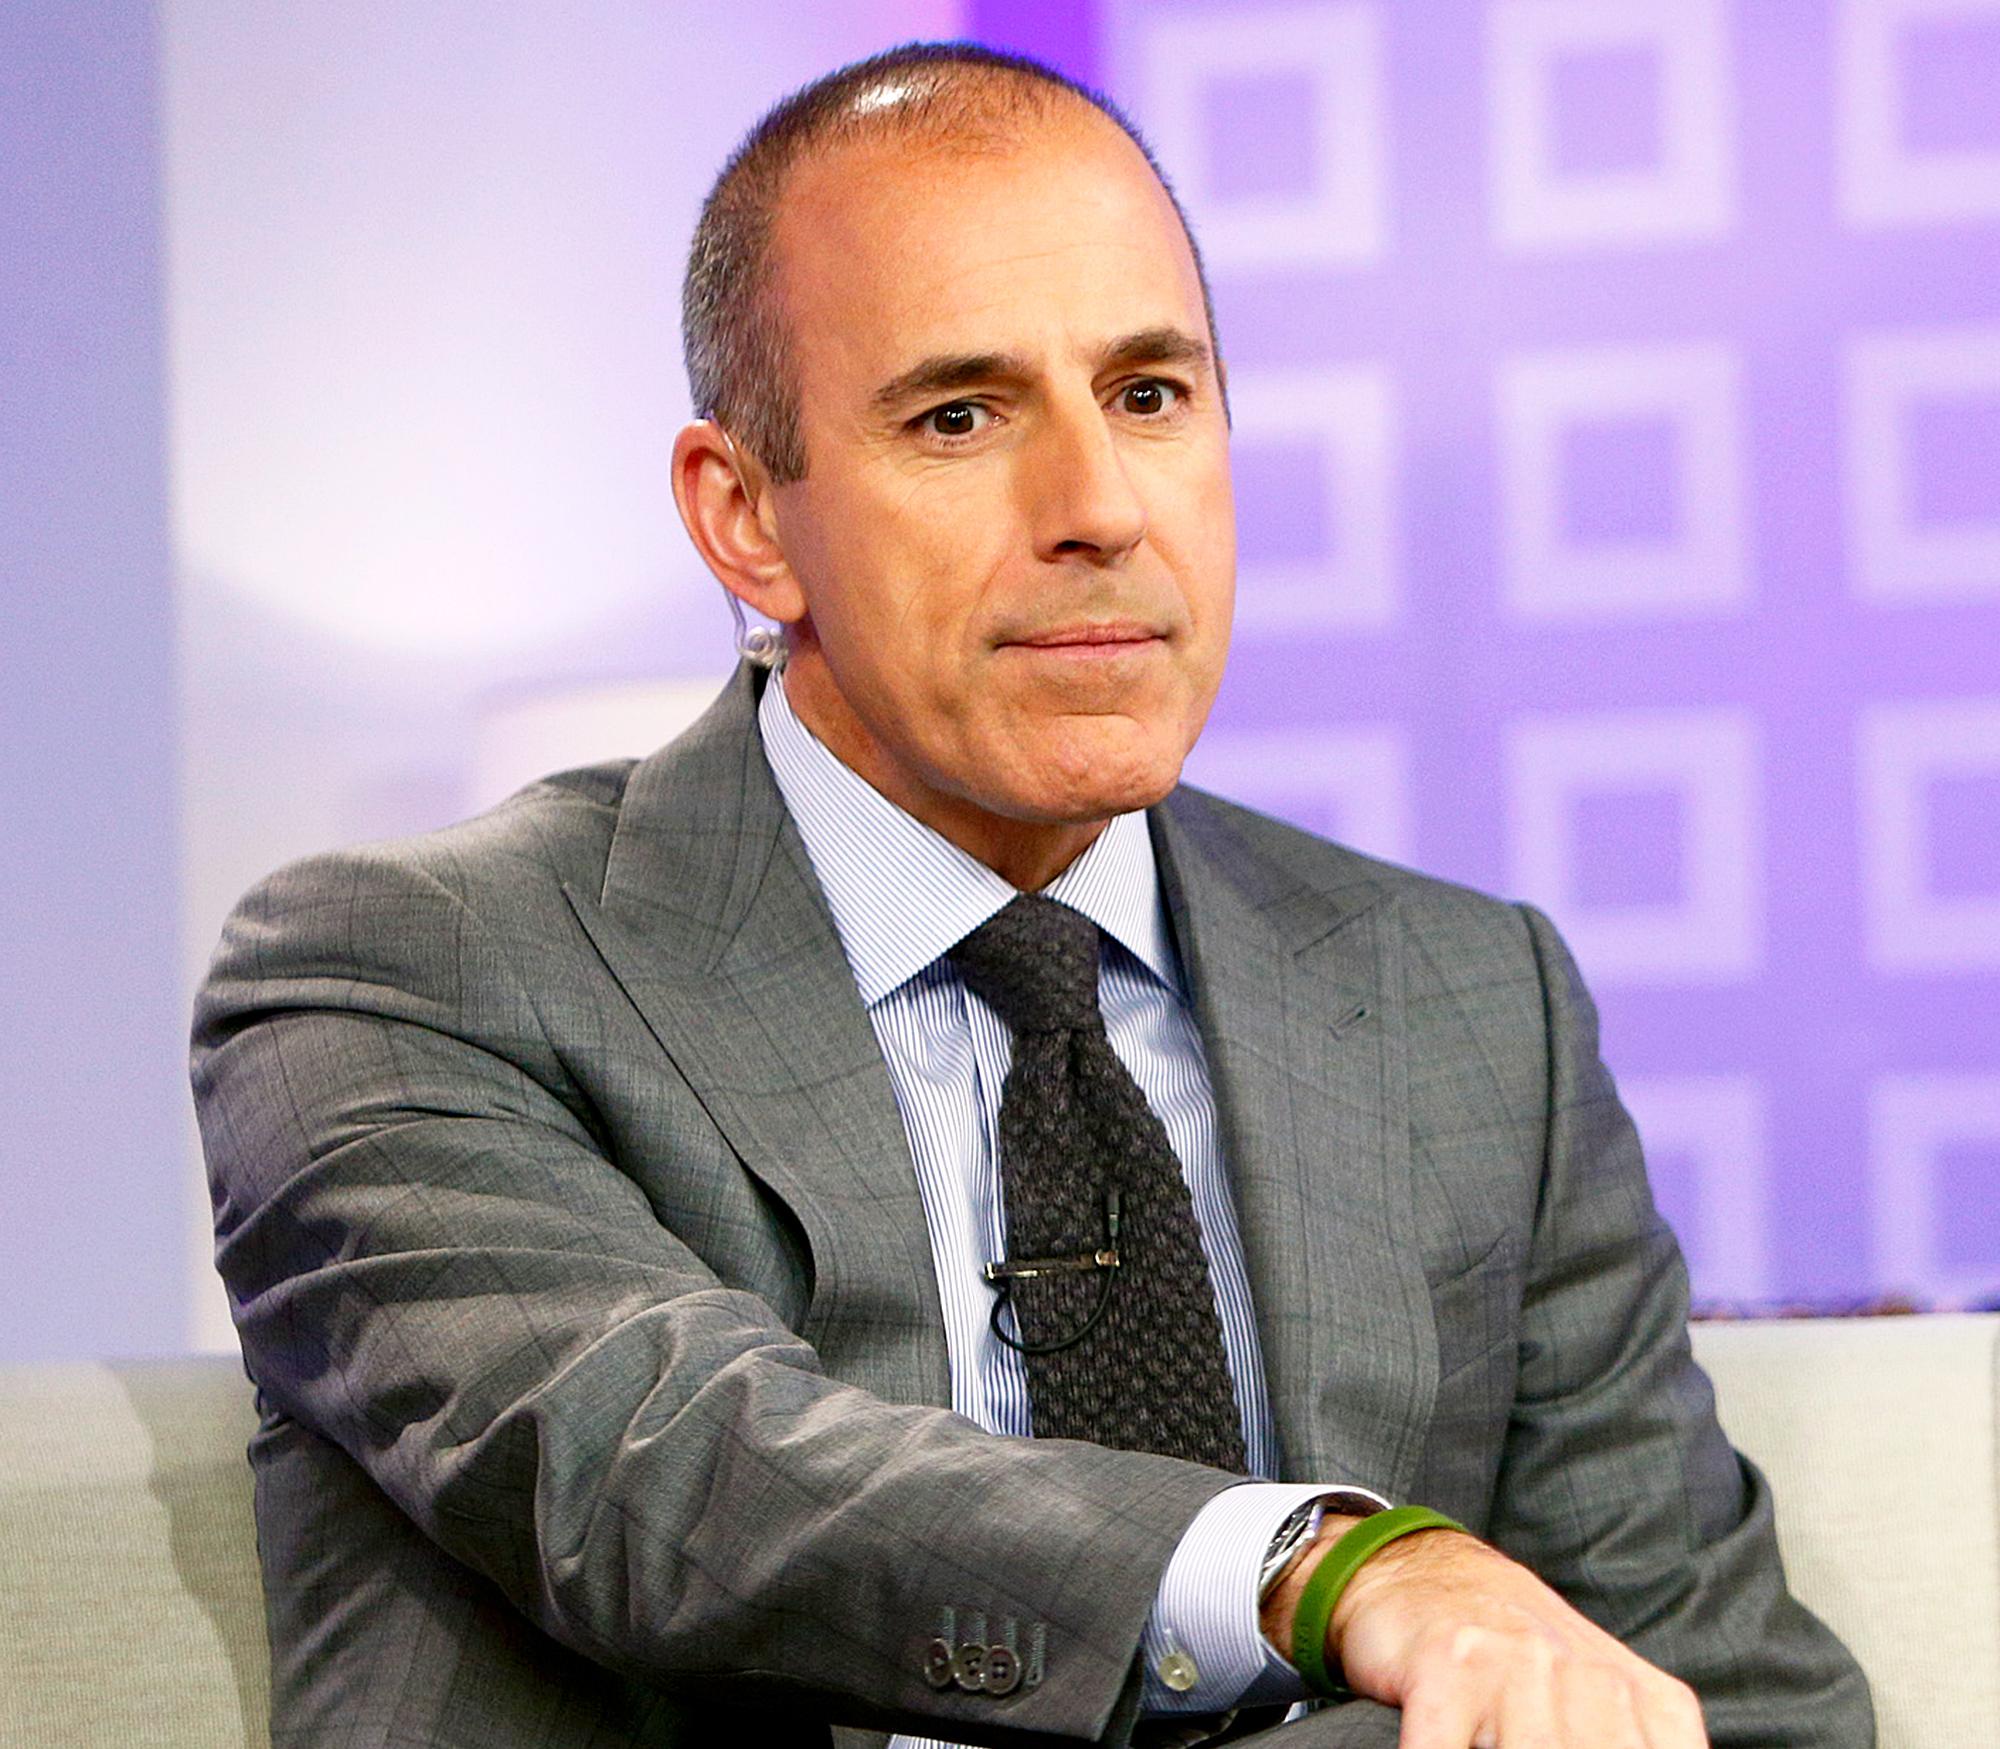 Leadership did not know about Matt Lauer behavior — NBC internal report